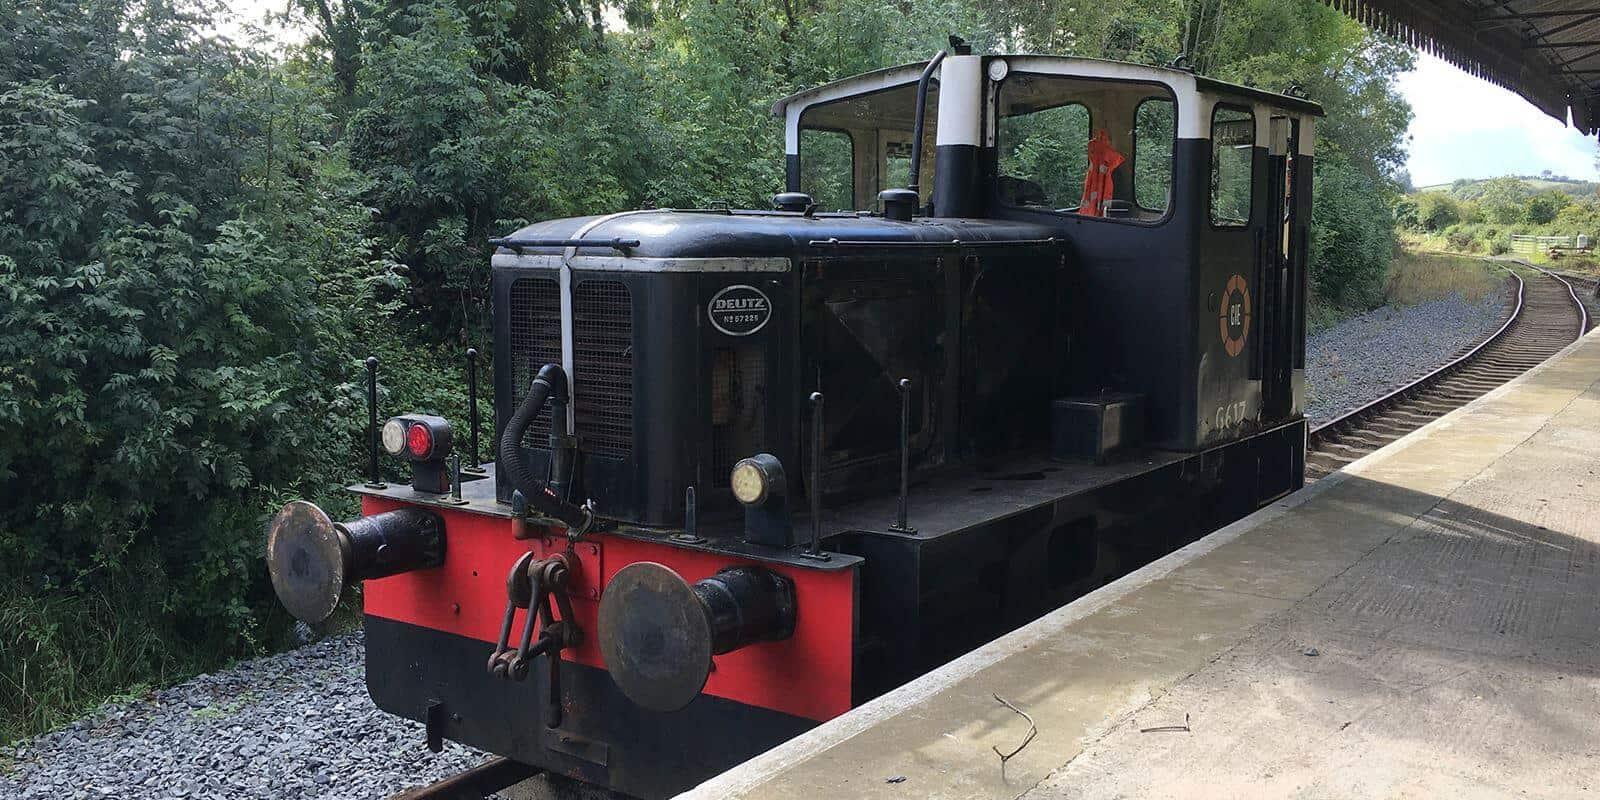 News | Downpatrick & County Down Railway